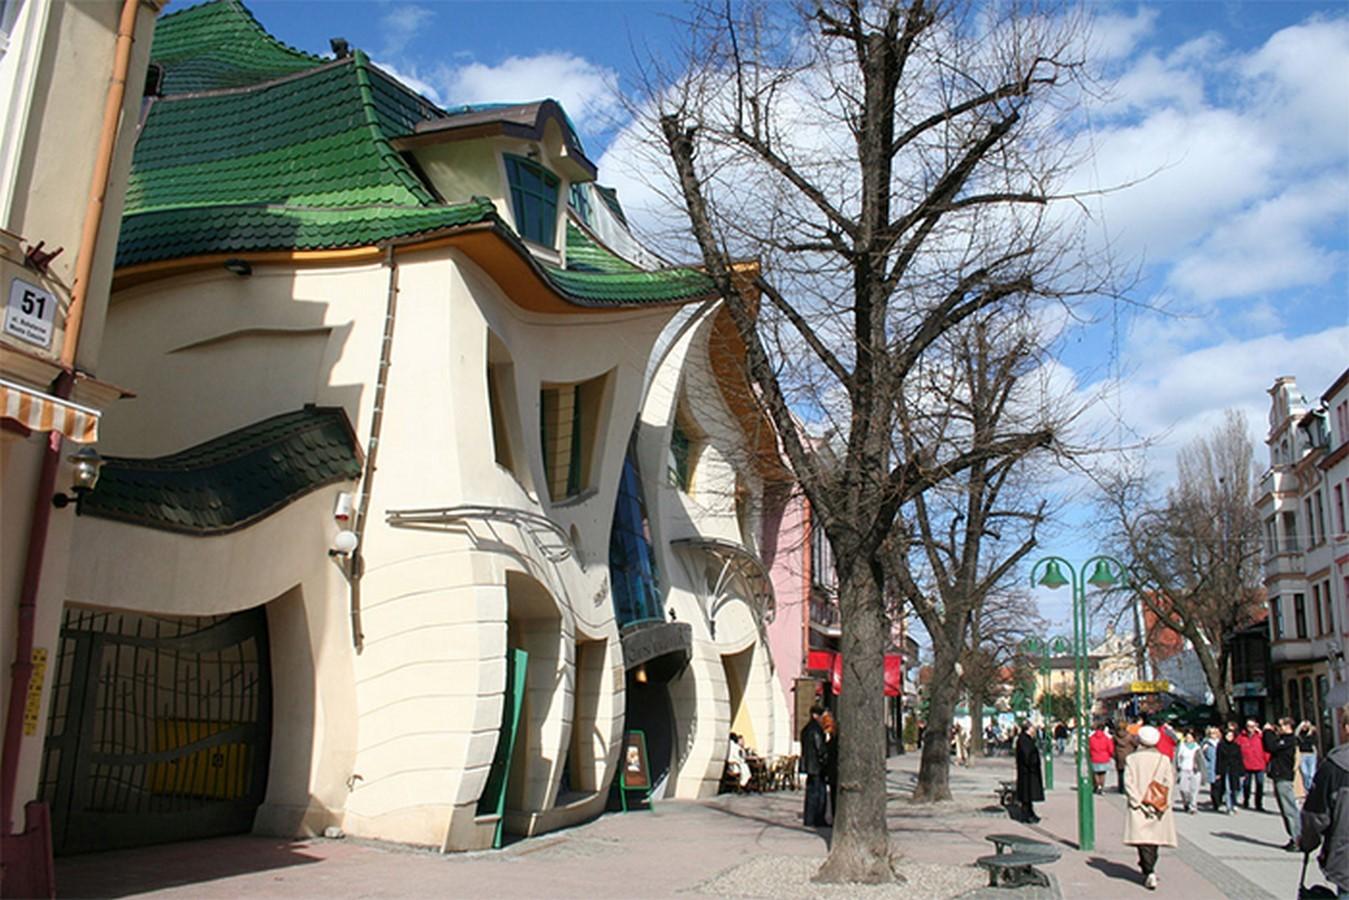 The Crooked House by Szotynscy and Zalenski - Sheet1